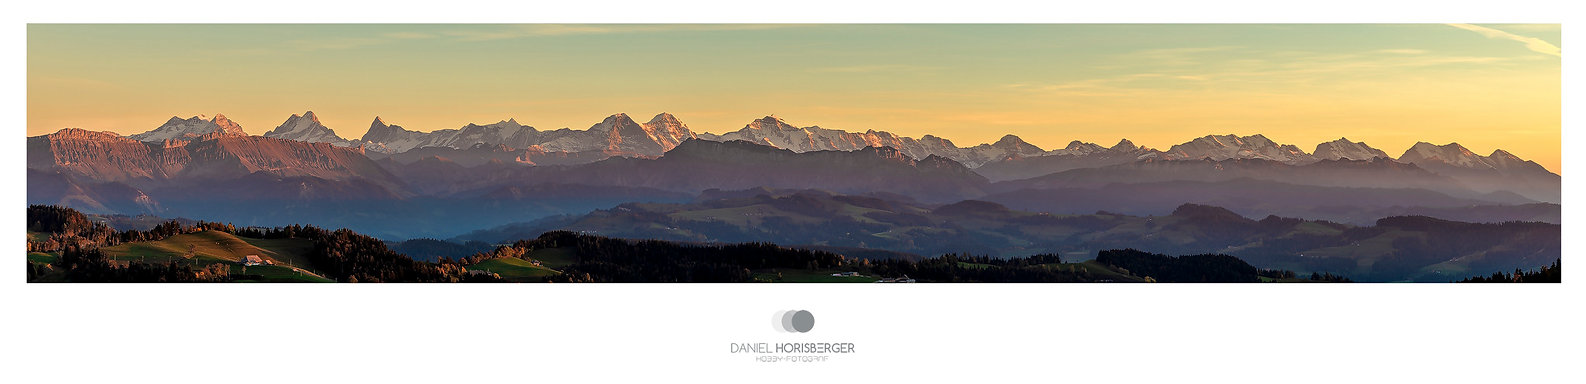 D85_2064-Pano-GZD - 2048 Weisser rahmen-